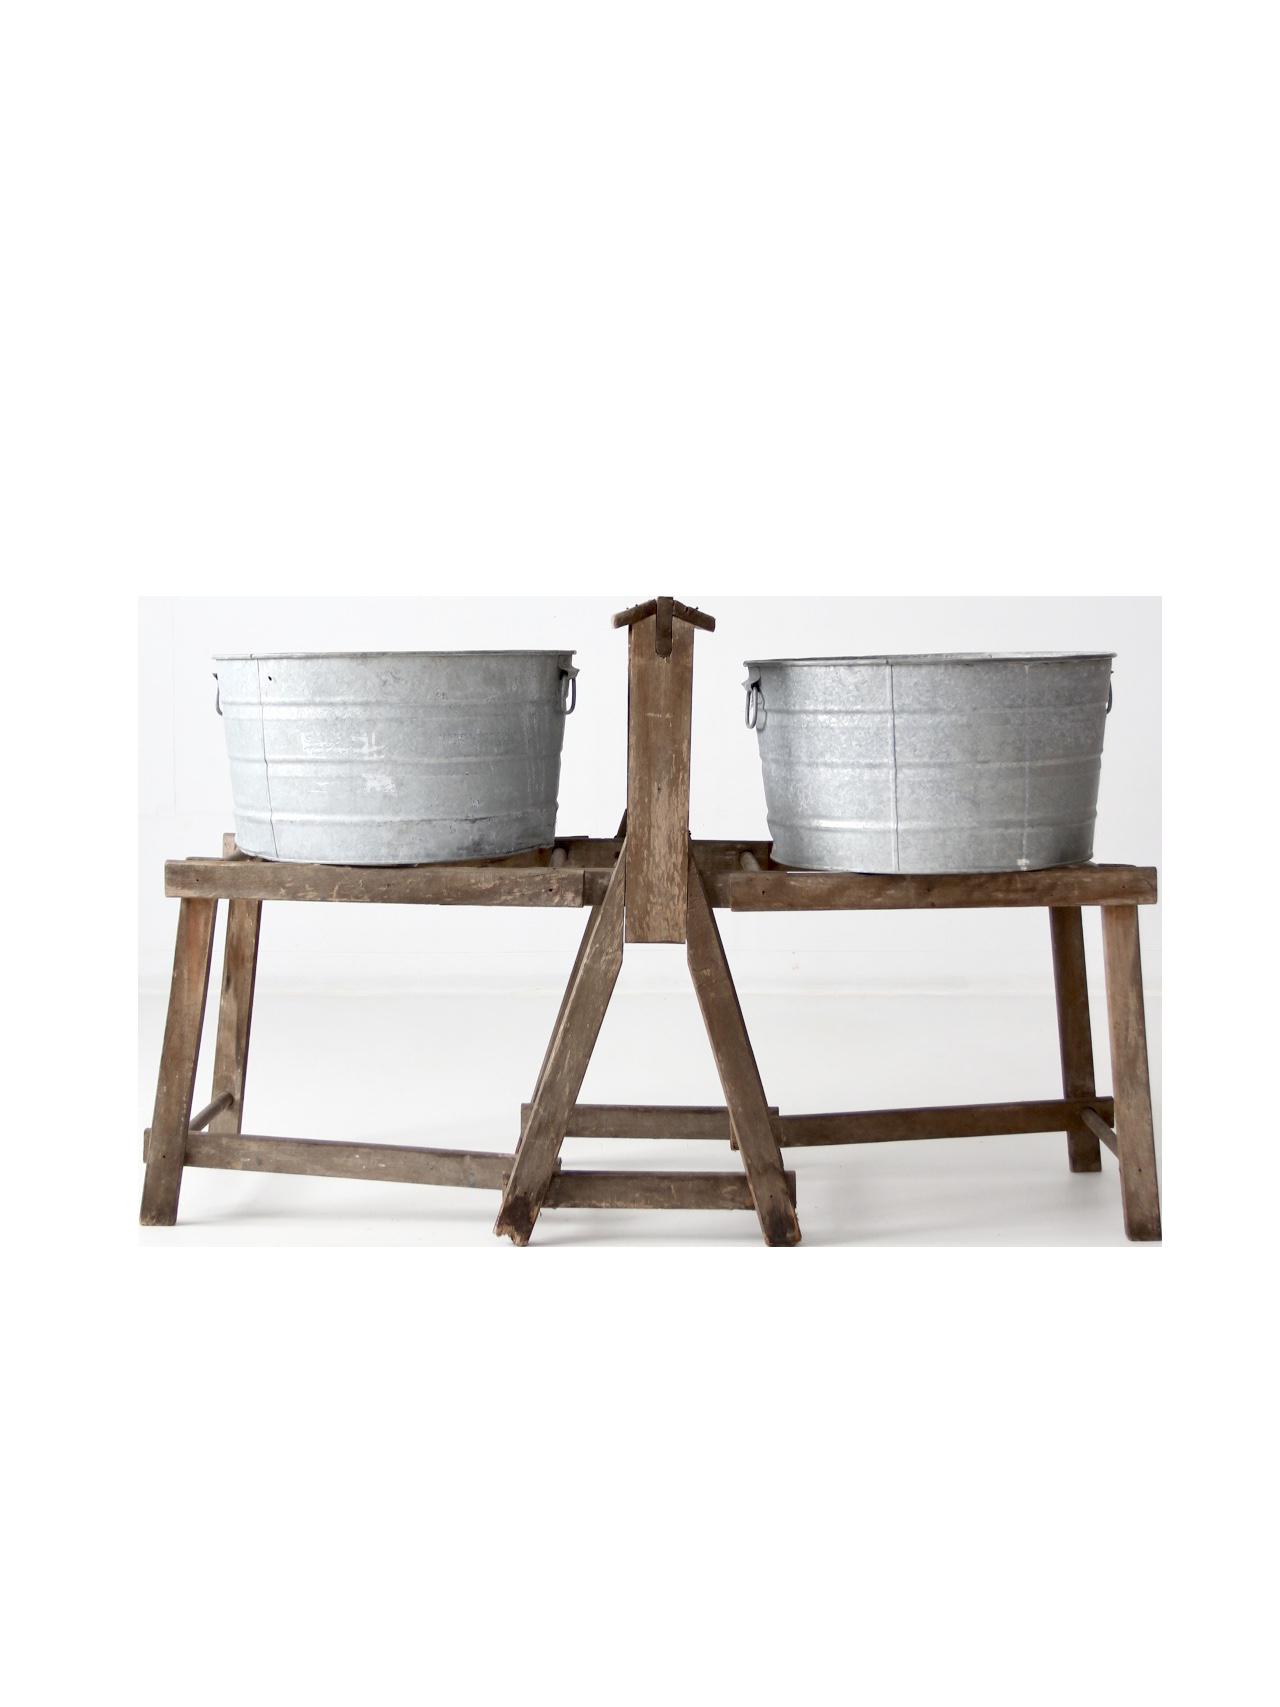 Antique Primitive Wash Tub Stand Chairish